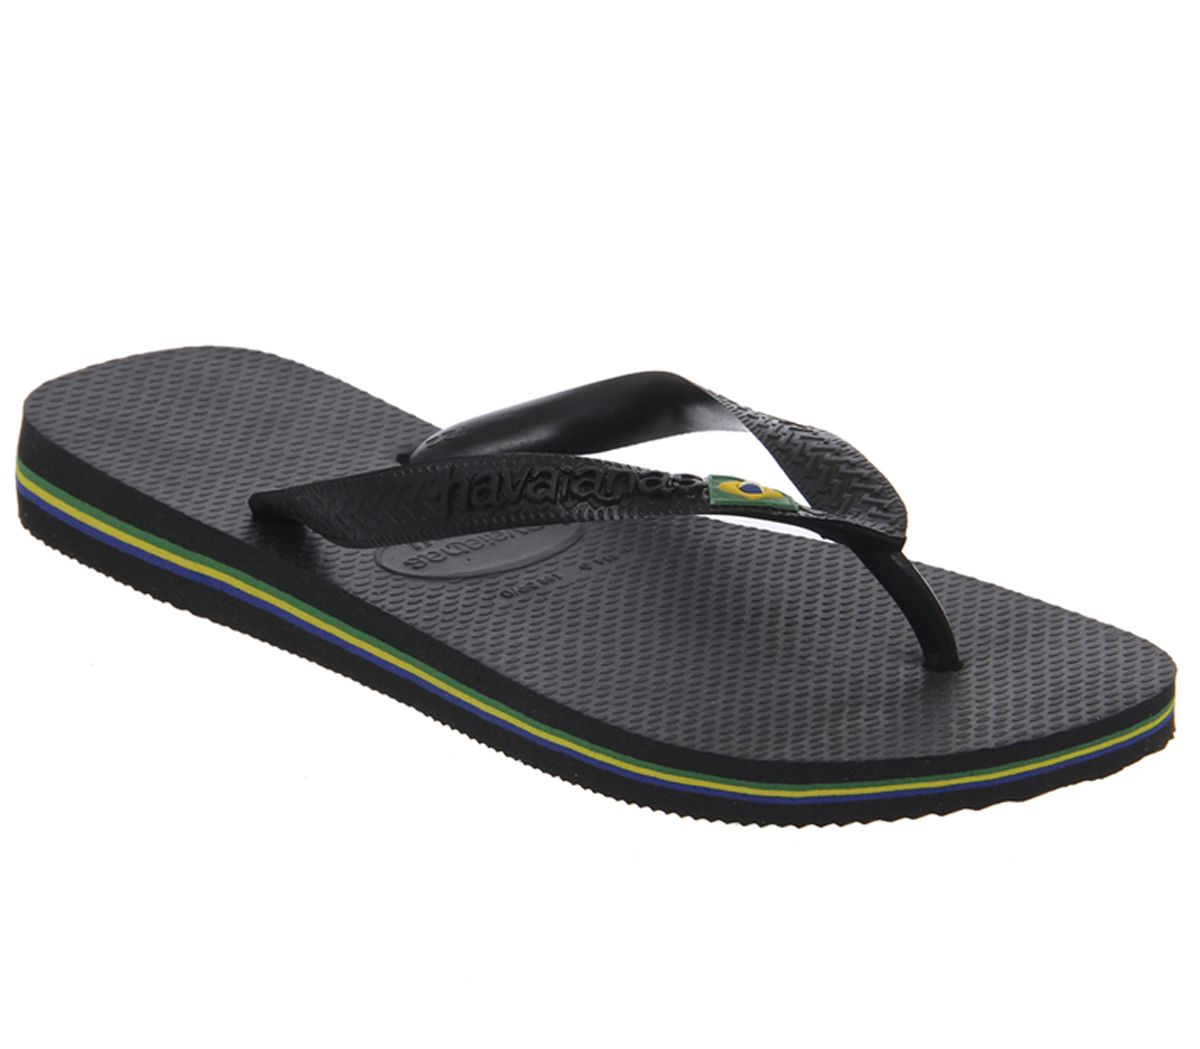 aa225383aaa8 Womens-Havaianas-Brazil-Flip-Flop-Black-Rubber-Sandals thumbnail